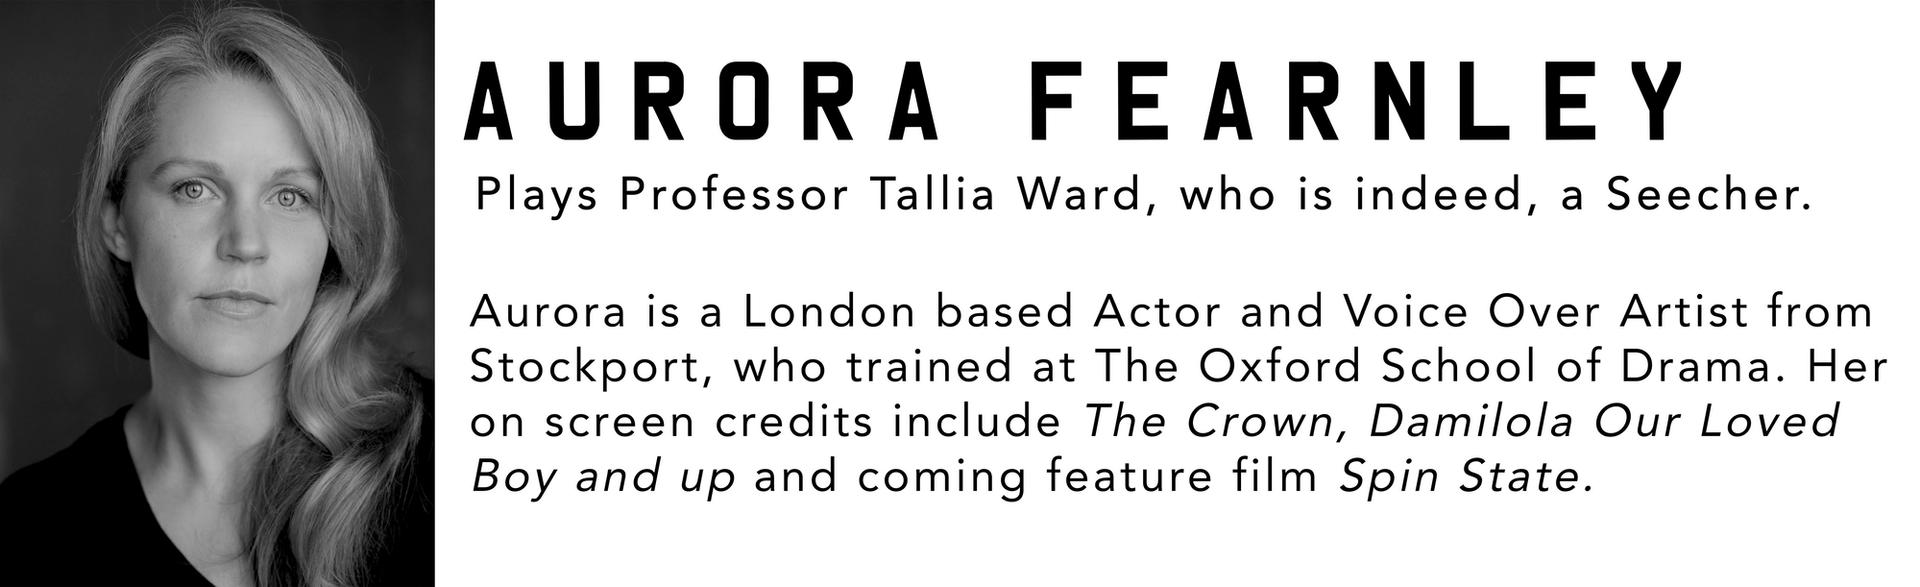 Aurora Fearnley